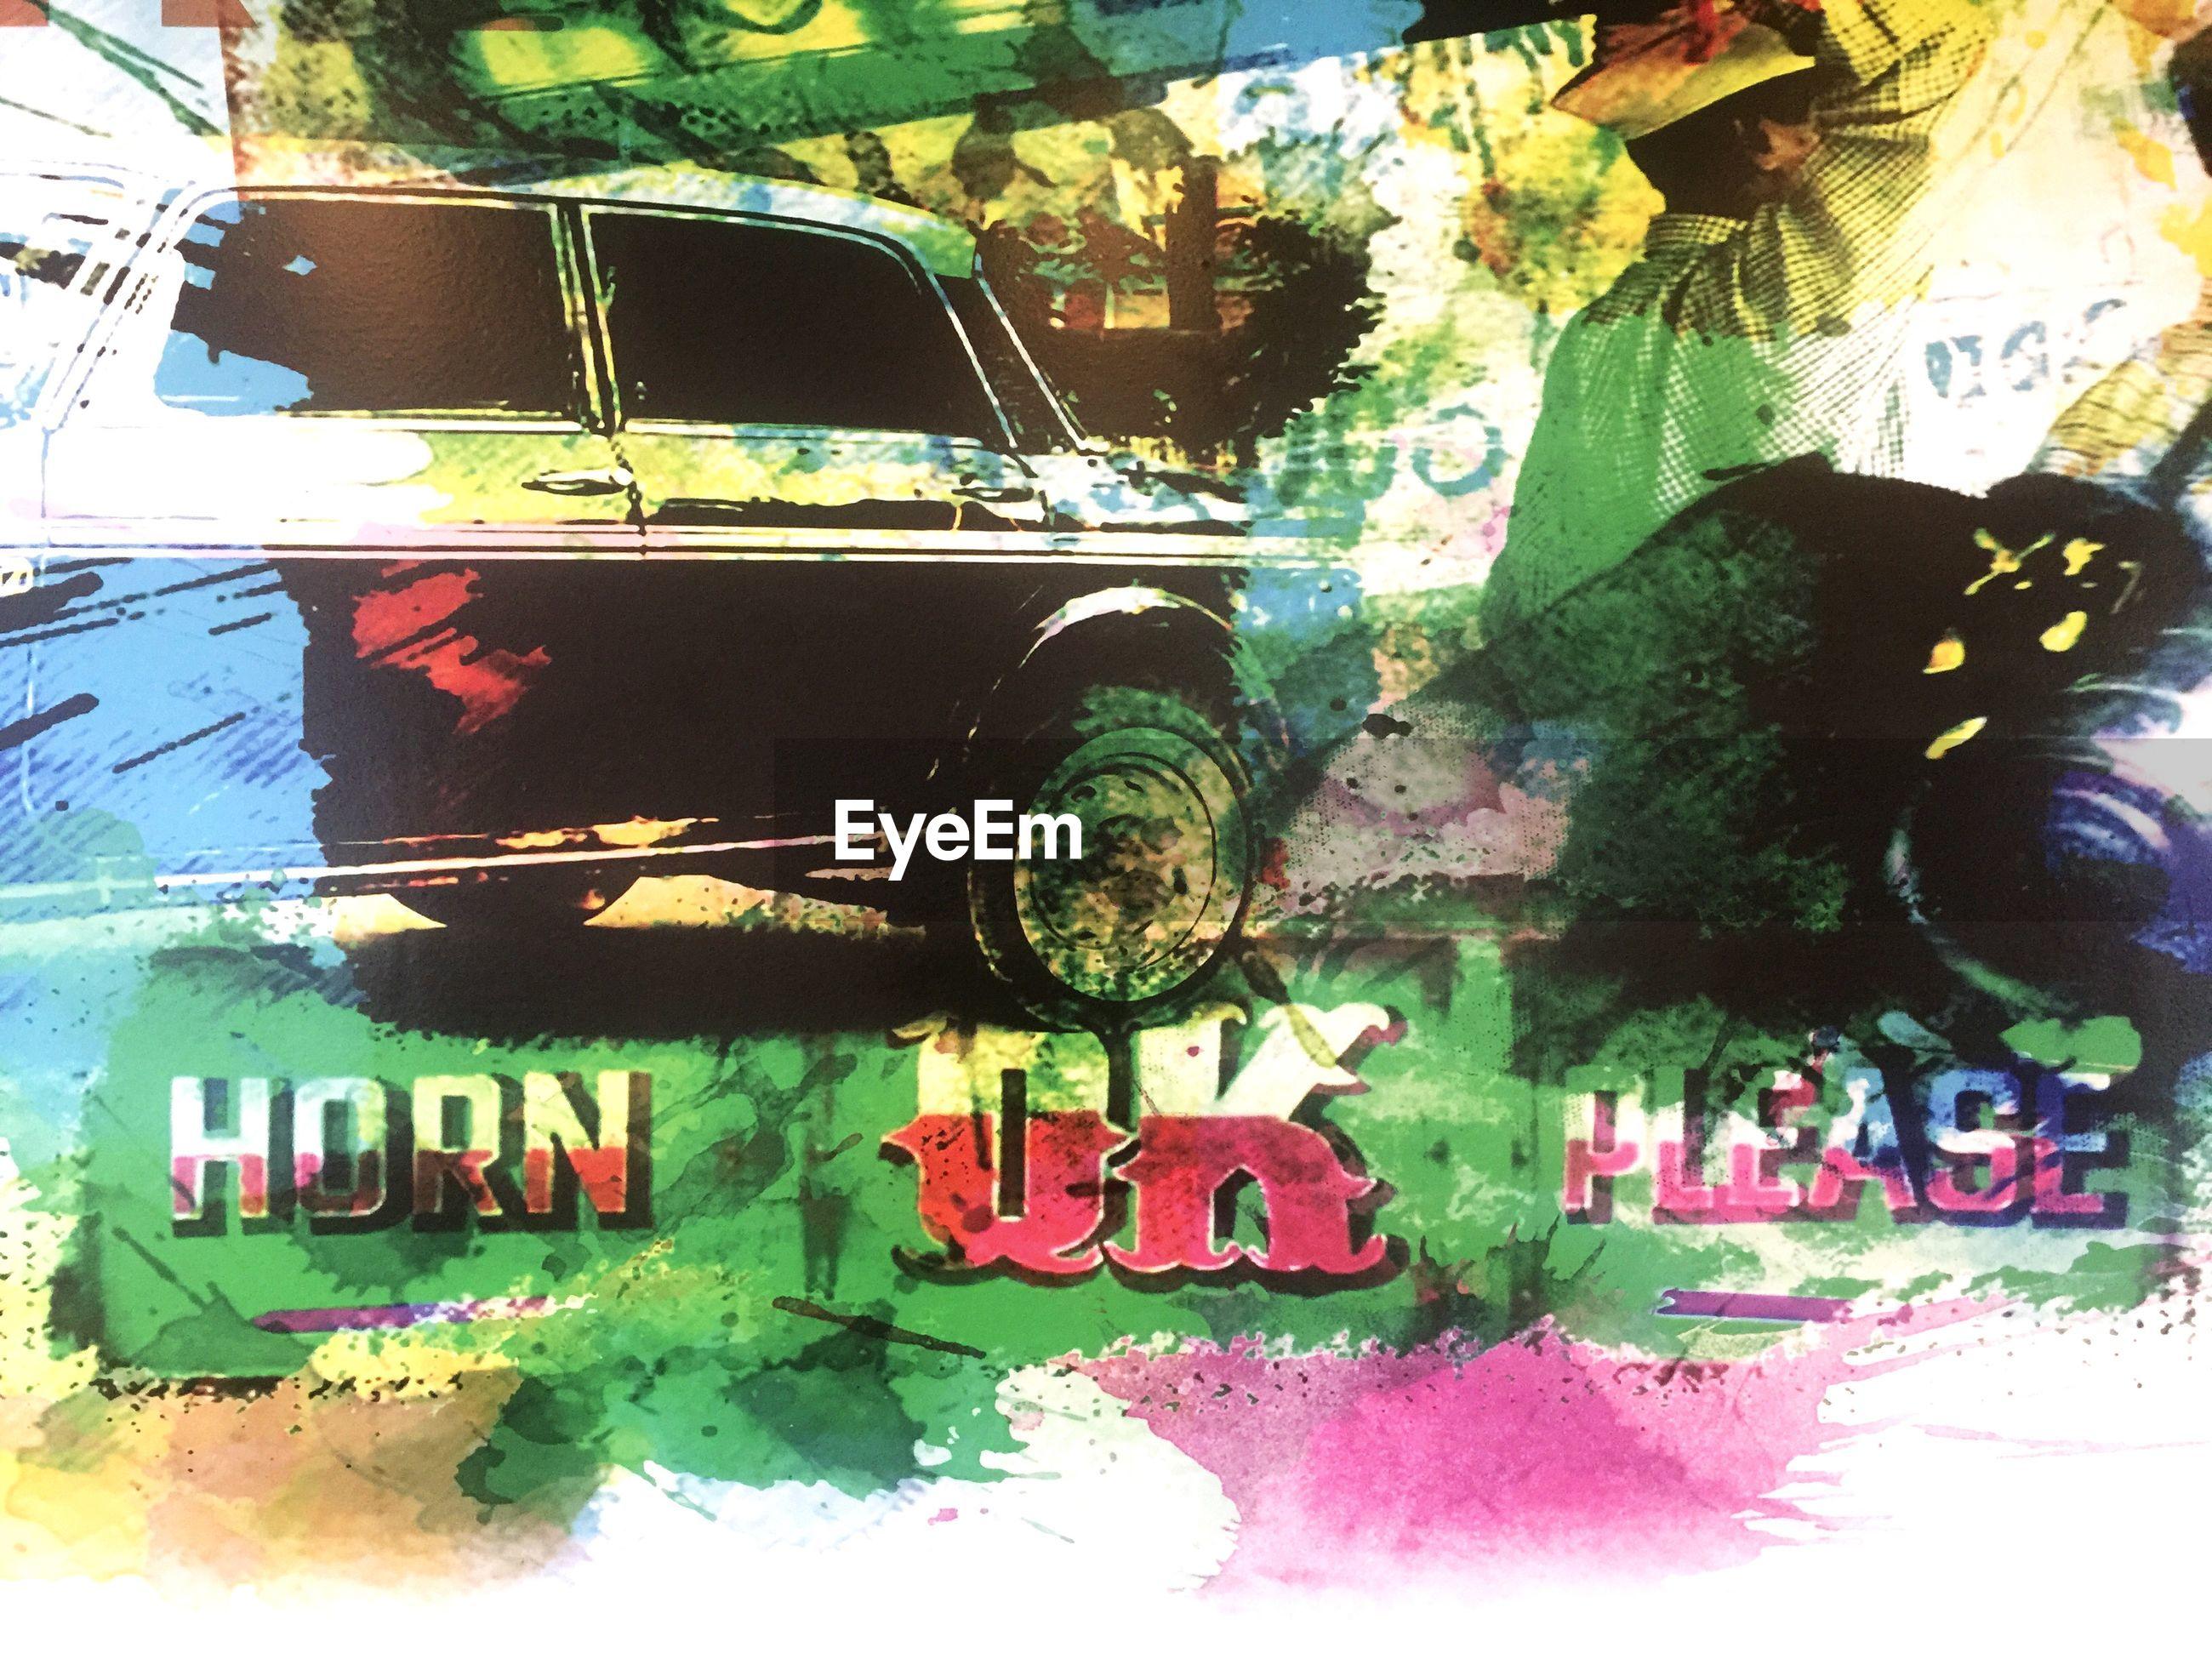 HIGH ANGLE VIEW OF GRAFFITI ON CAR